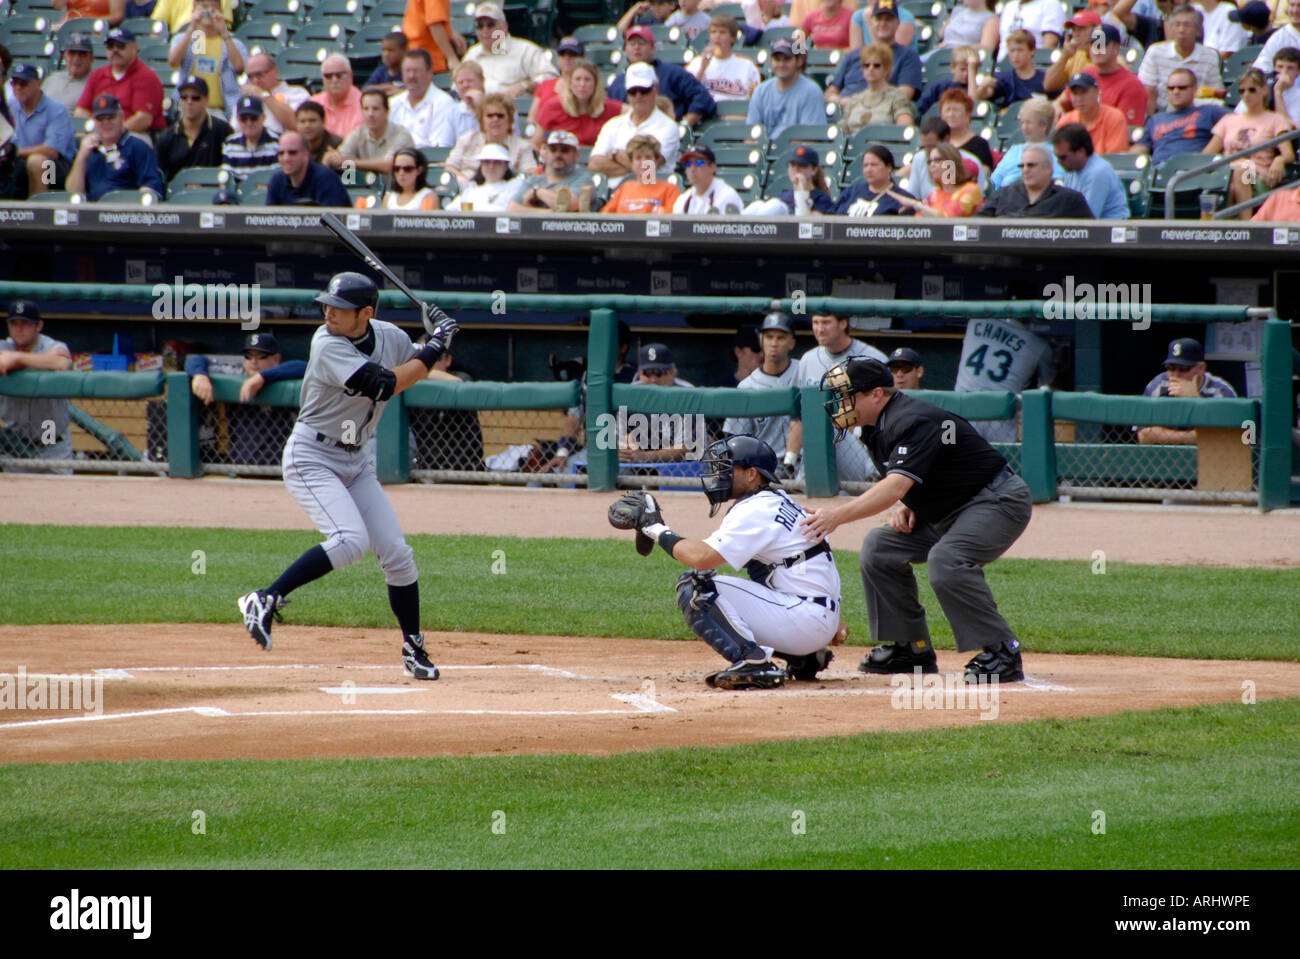 Detroit Tiger Professional Major League Baseball game at Comerica Park Detroit Michigan - Stock Image